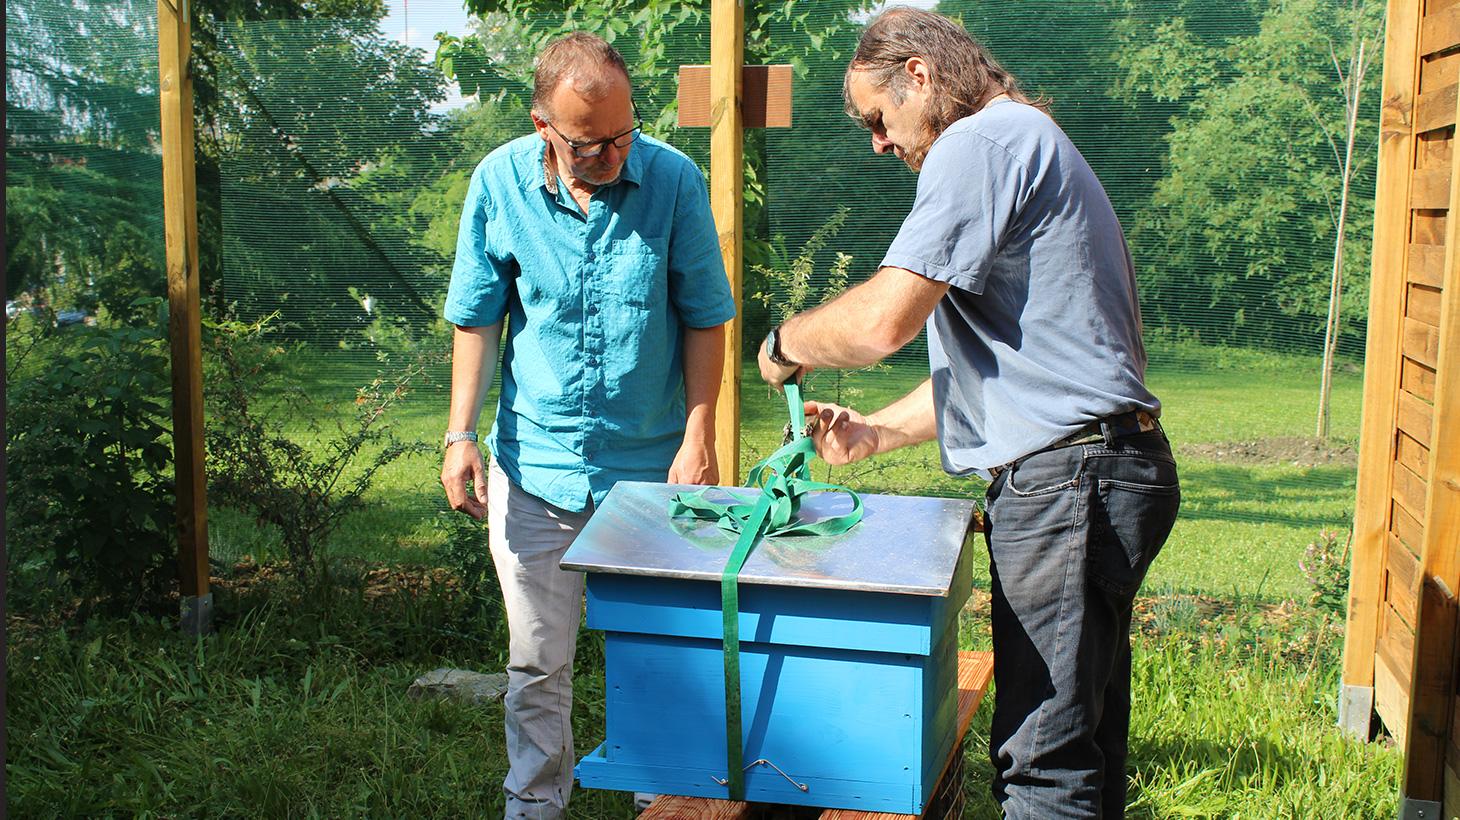 Installation des ruches par Serge Krivobok et Patrick Marcireau